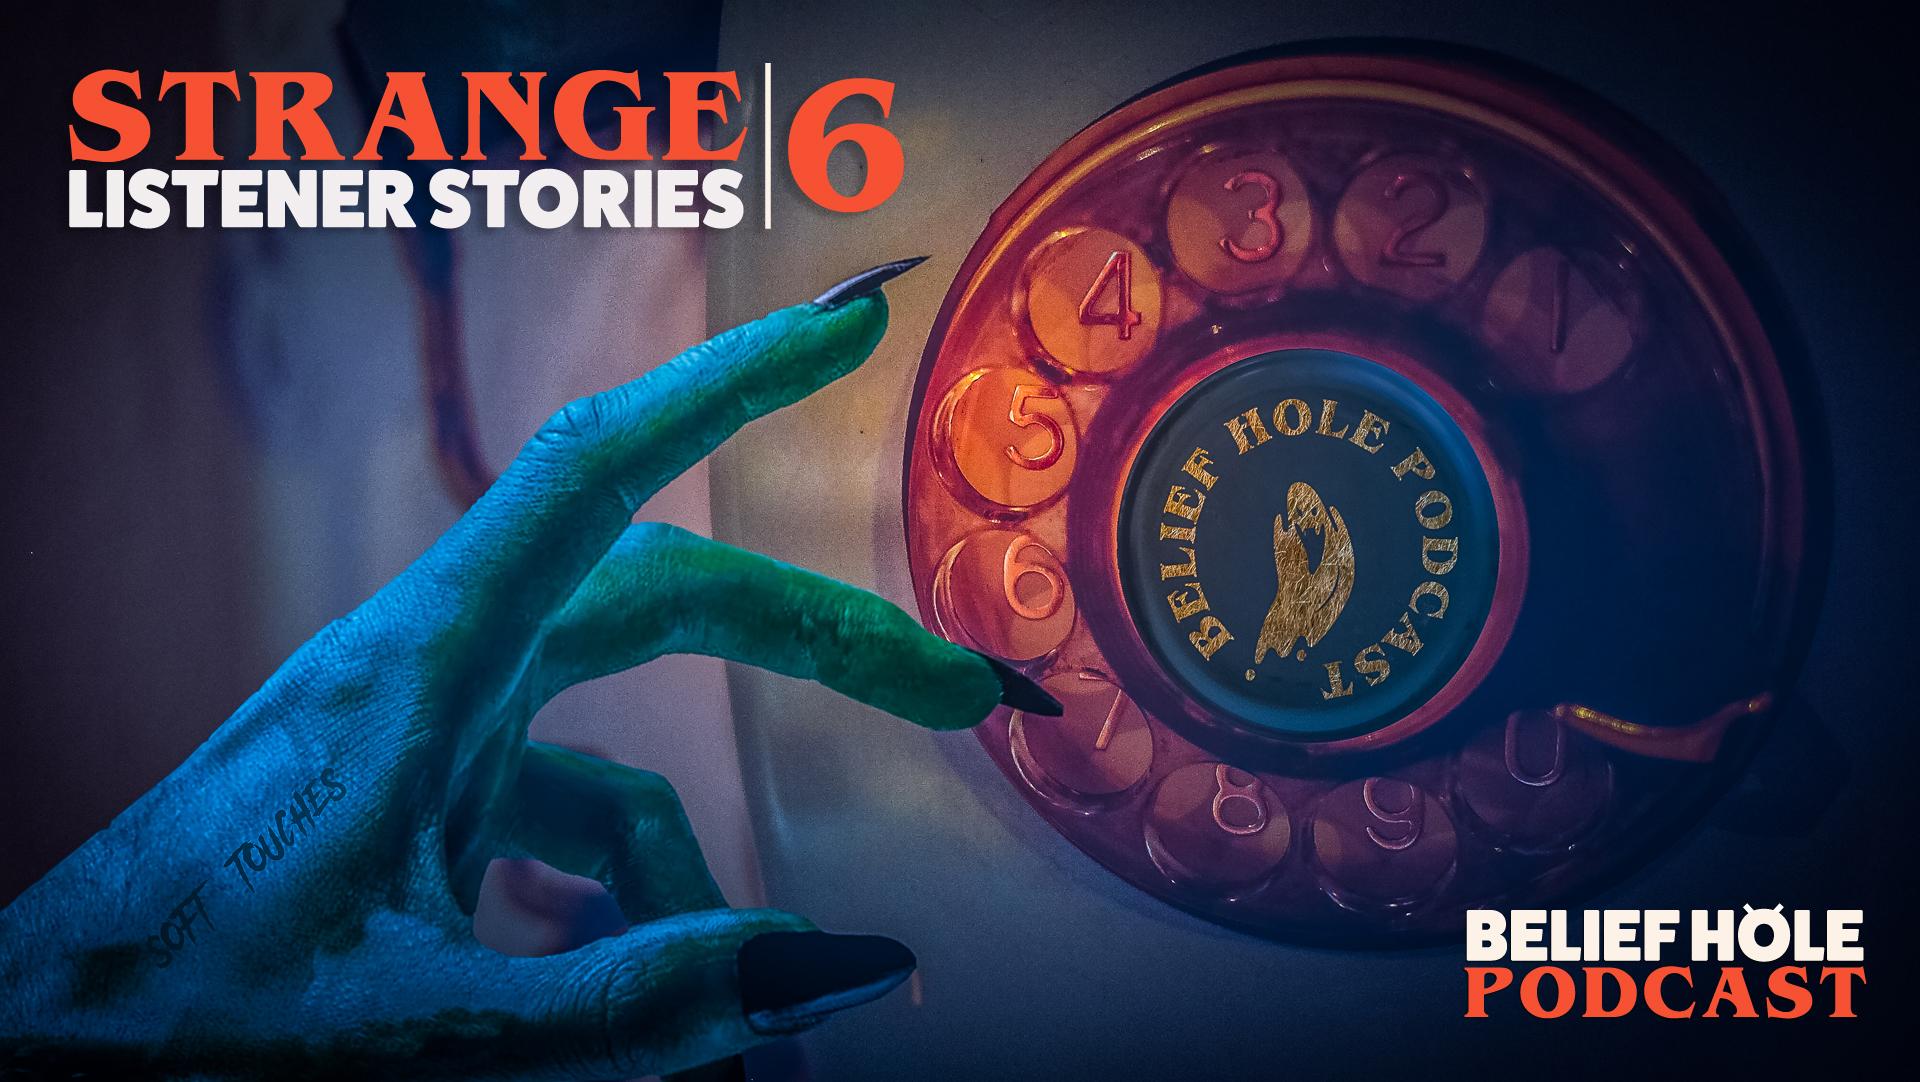 STRANGE-LISTENER-STORIES-DOGMAN-HAUNTED-HOUSES-SHADOW-PEOPLE-BELIEF-HOLE-PODAST